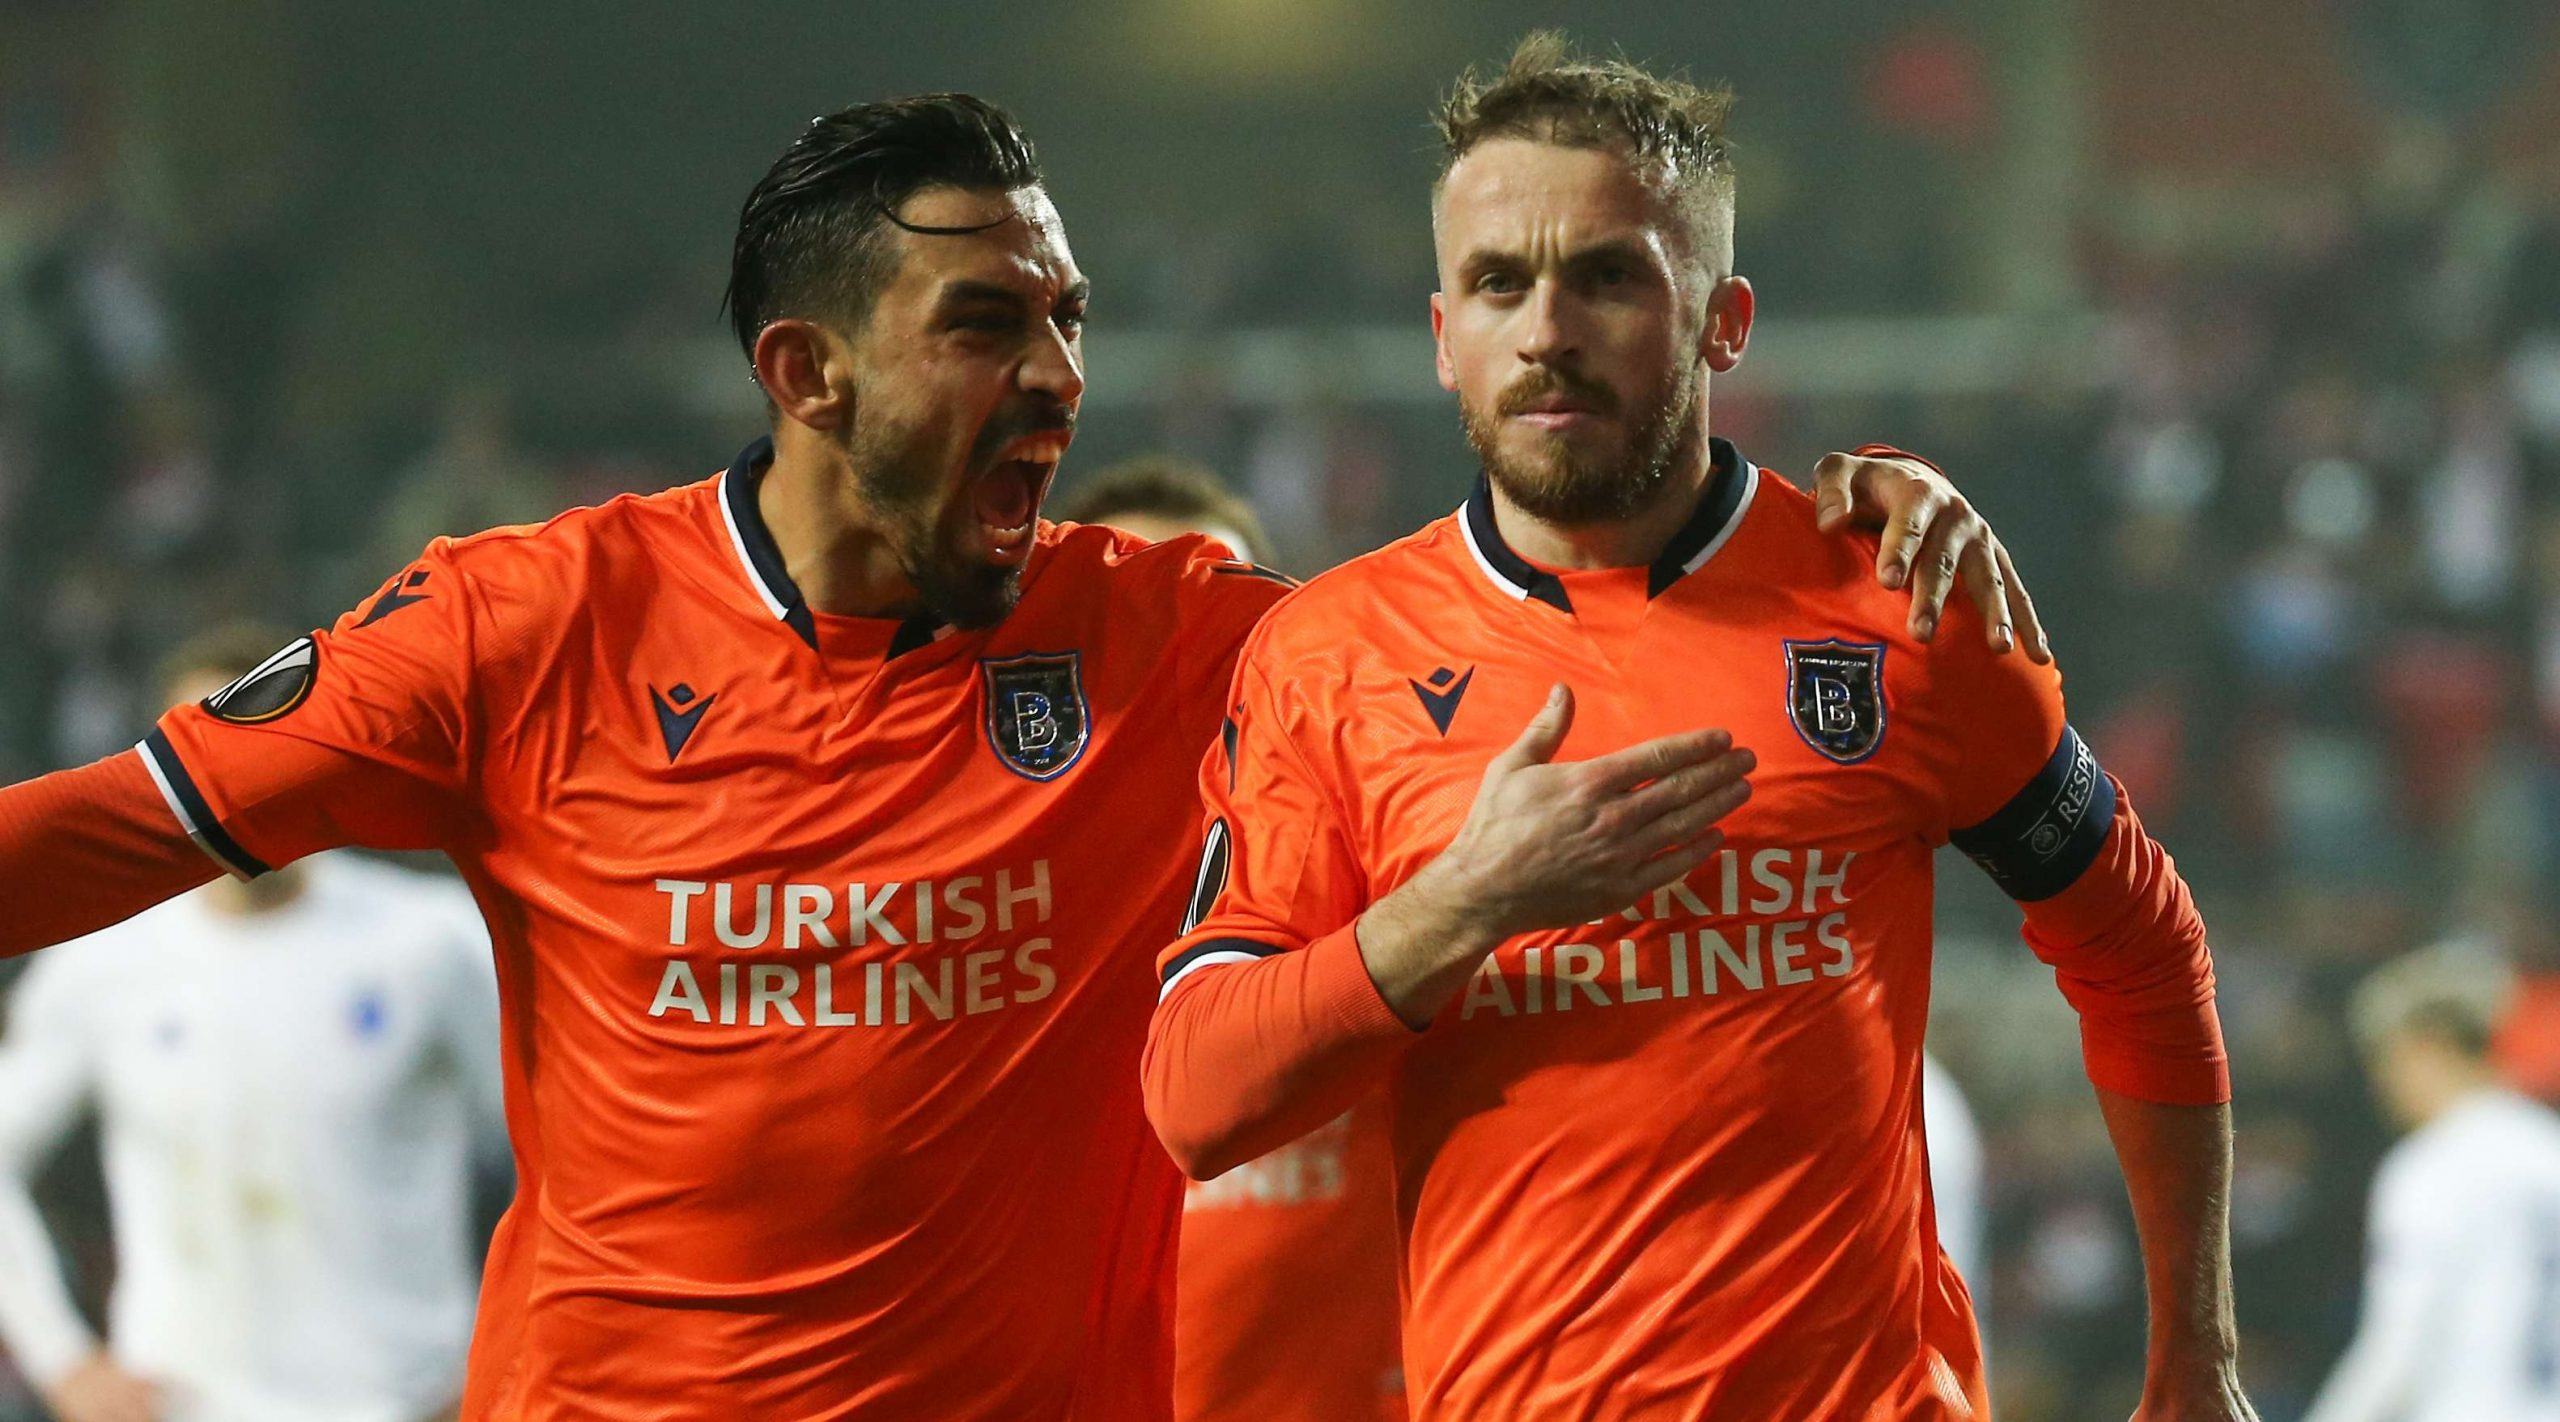 Prediksi Bola Copenhagen vs Istanbul Basaksehir 05 Agustus 2020 Liga Europa Babak 16 Besar